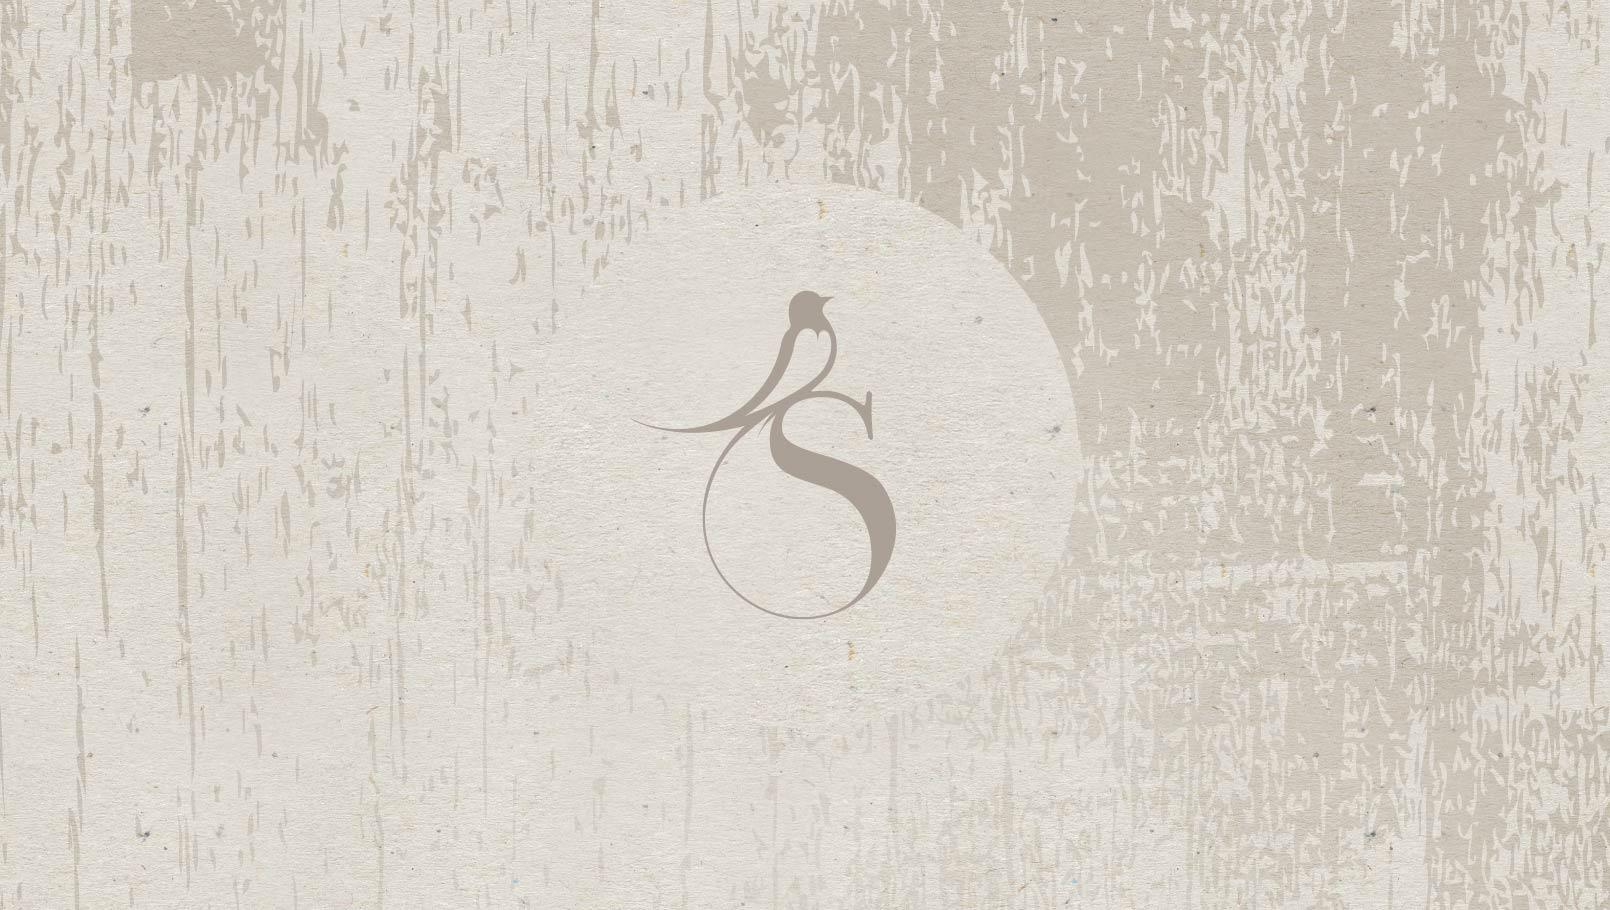 Brand and digital design Swallowtail Hill logo mark.